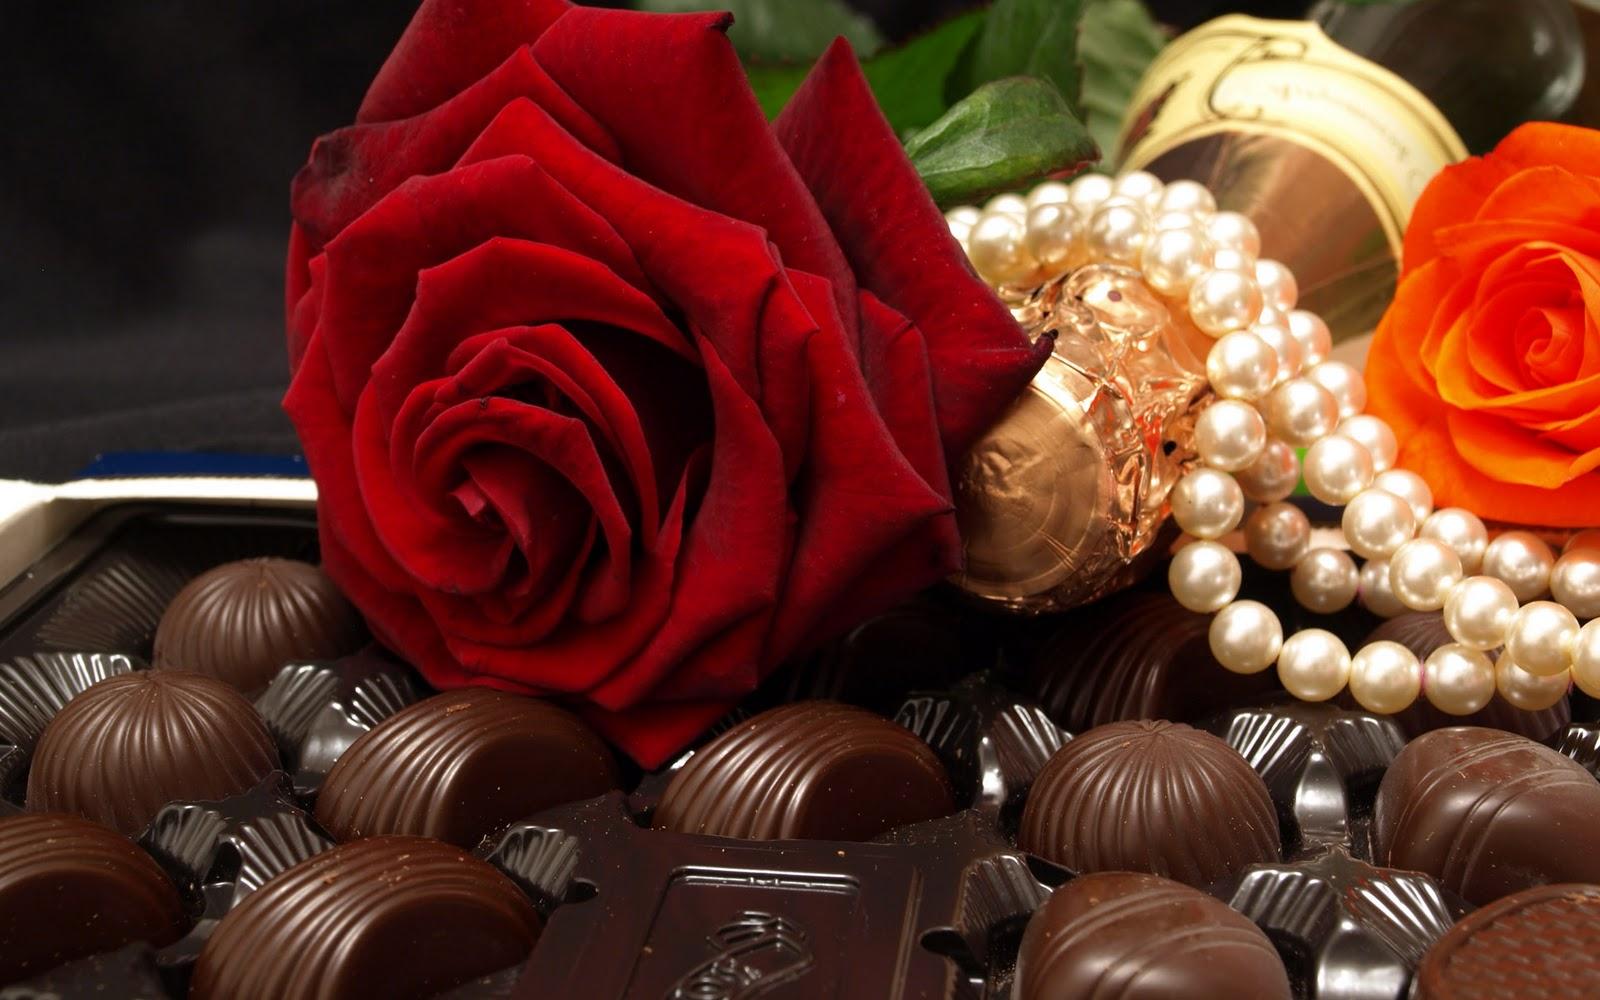 black chocolate chocolates chocolate chocolate bowl 1600x1000